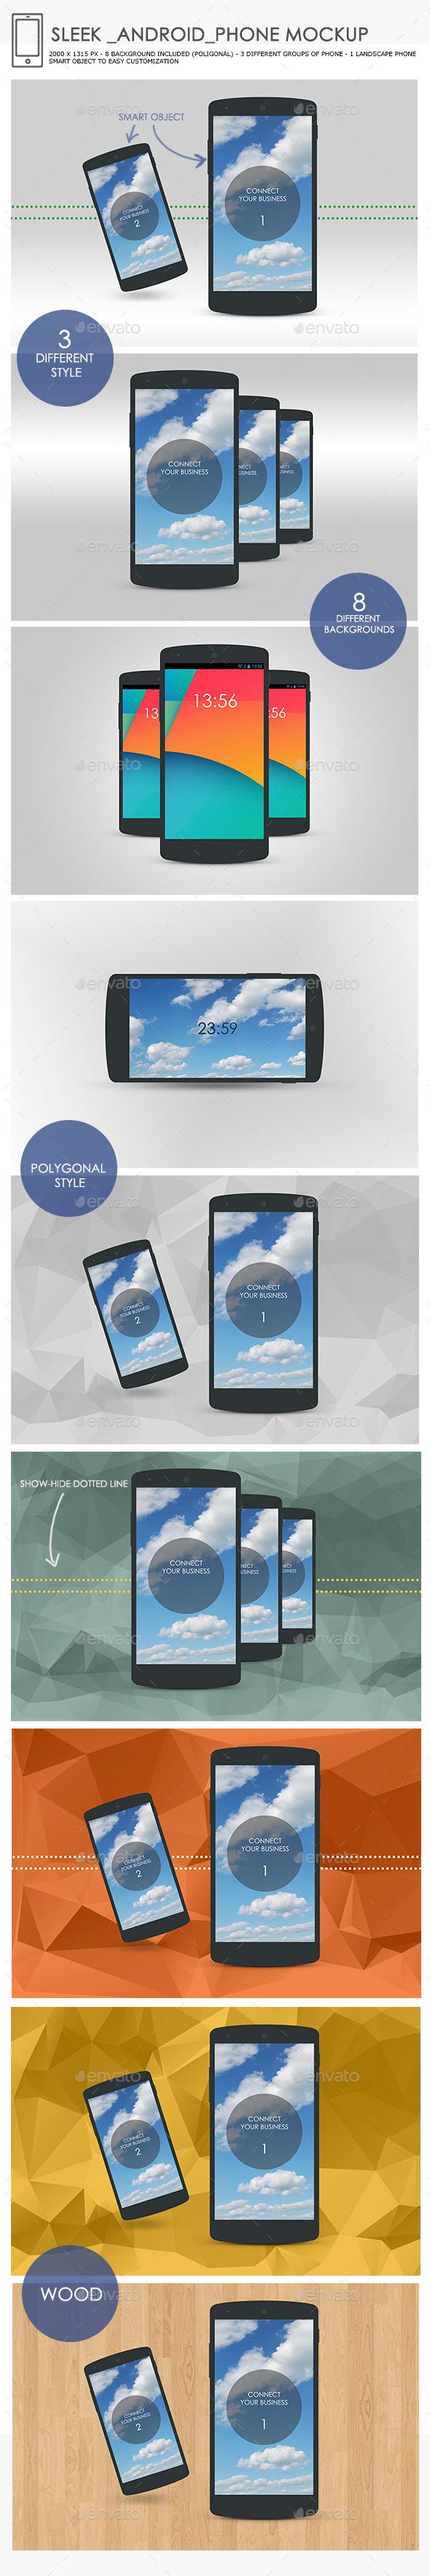 Sleek Android Phone Mockup - Mobile Displays